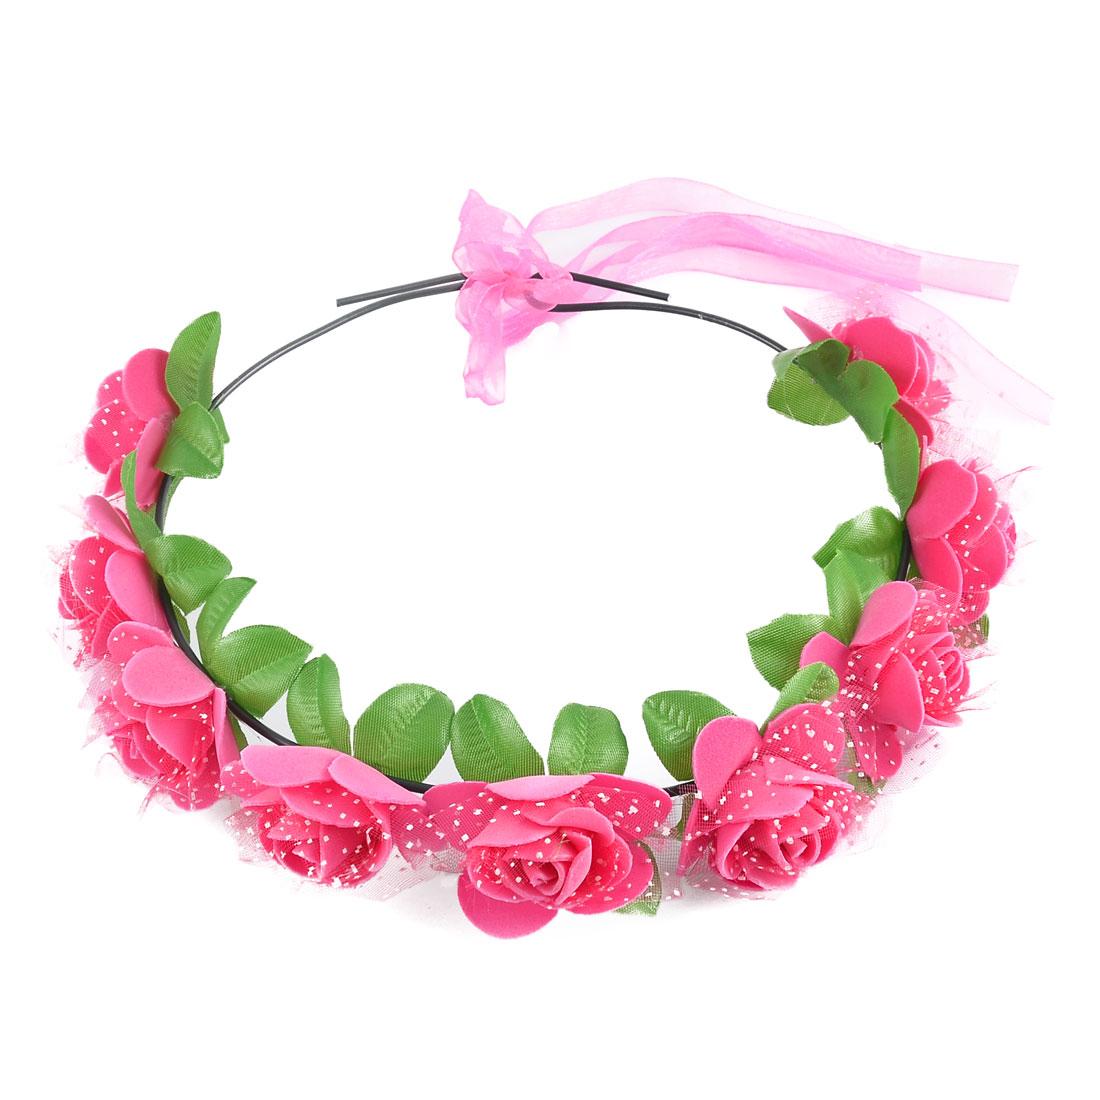 Women Handmade Rose Flowers Ribbon Hair Bands Head Wreath Fuchsia